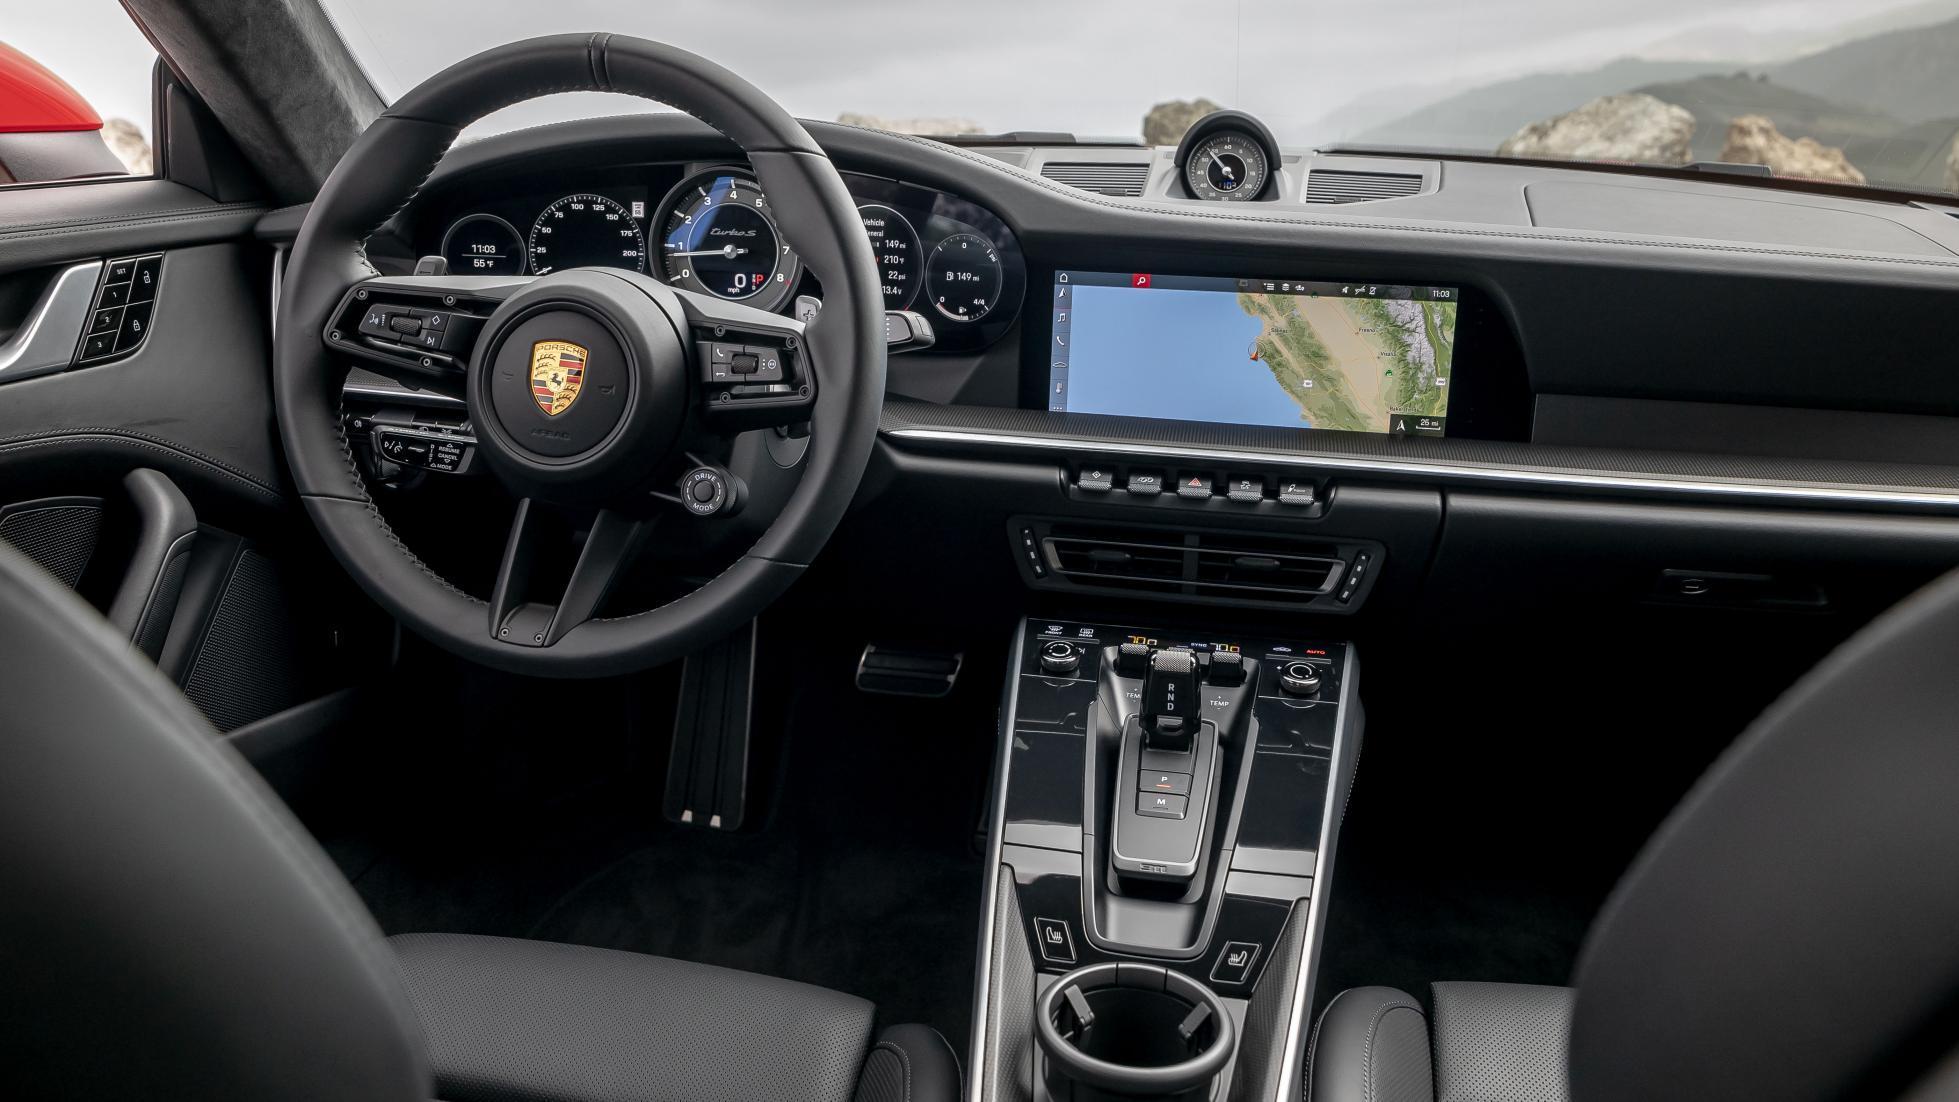 Interieur Porsche 911 Turbo 992 2020